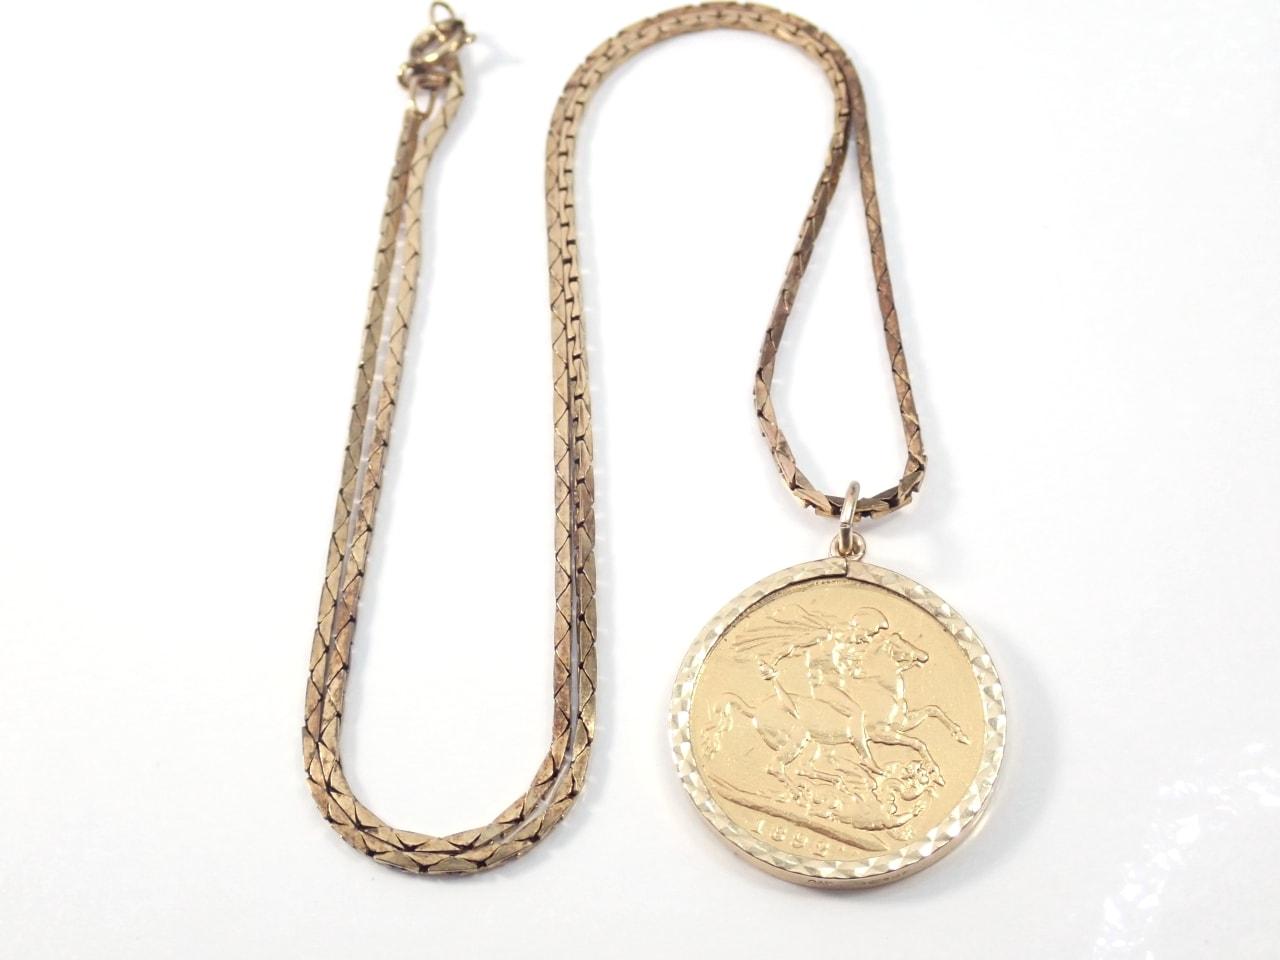 1892 Gold Full Sovereign Pendant 18 inch Box chain - Queen Victoria -14.8grams